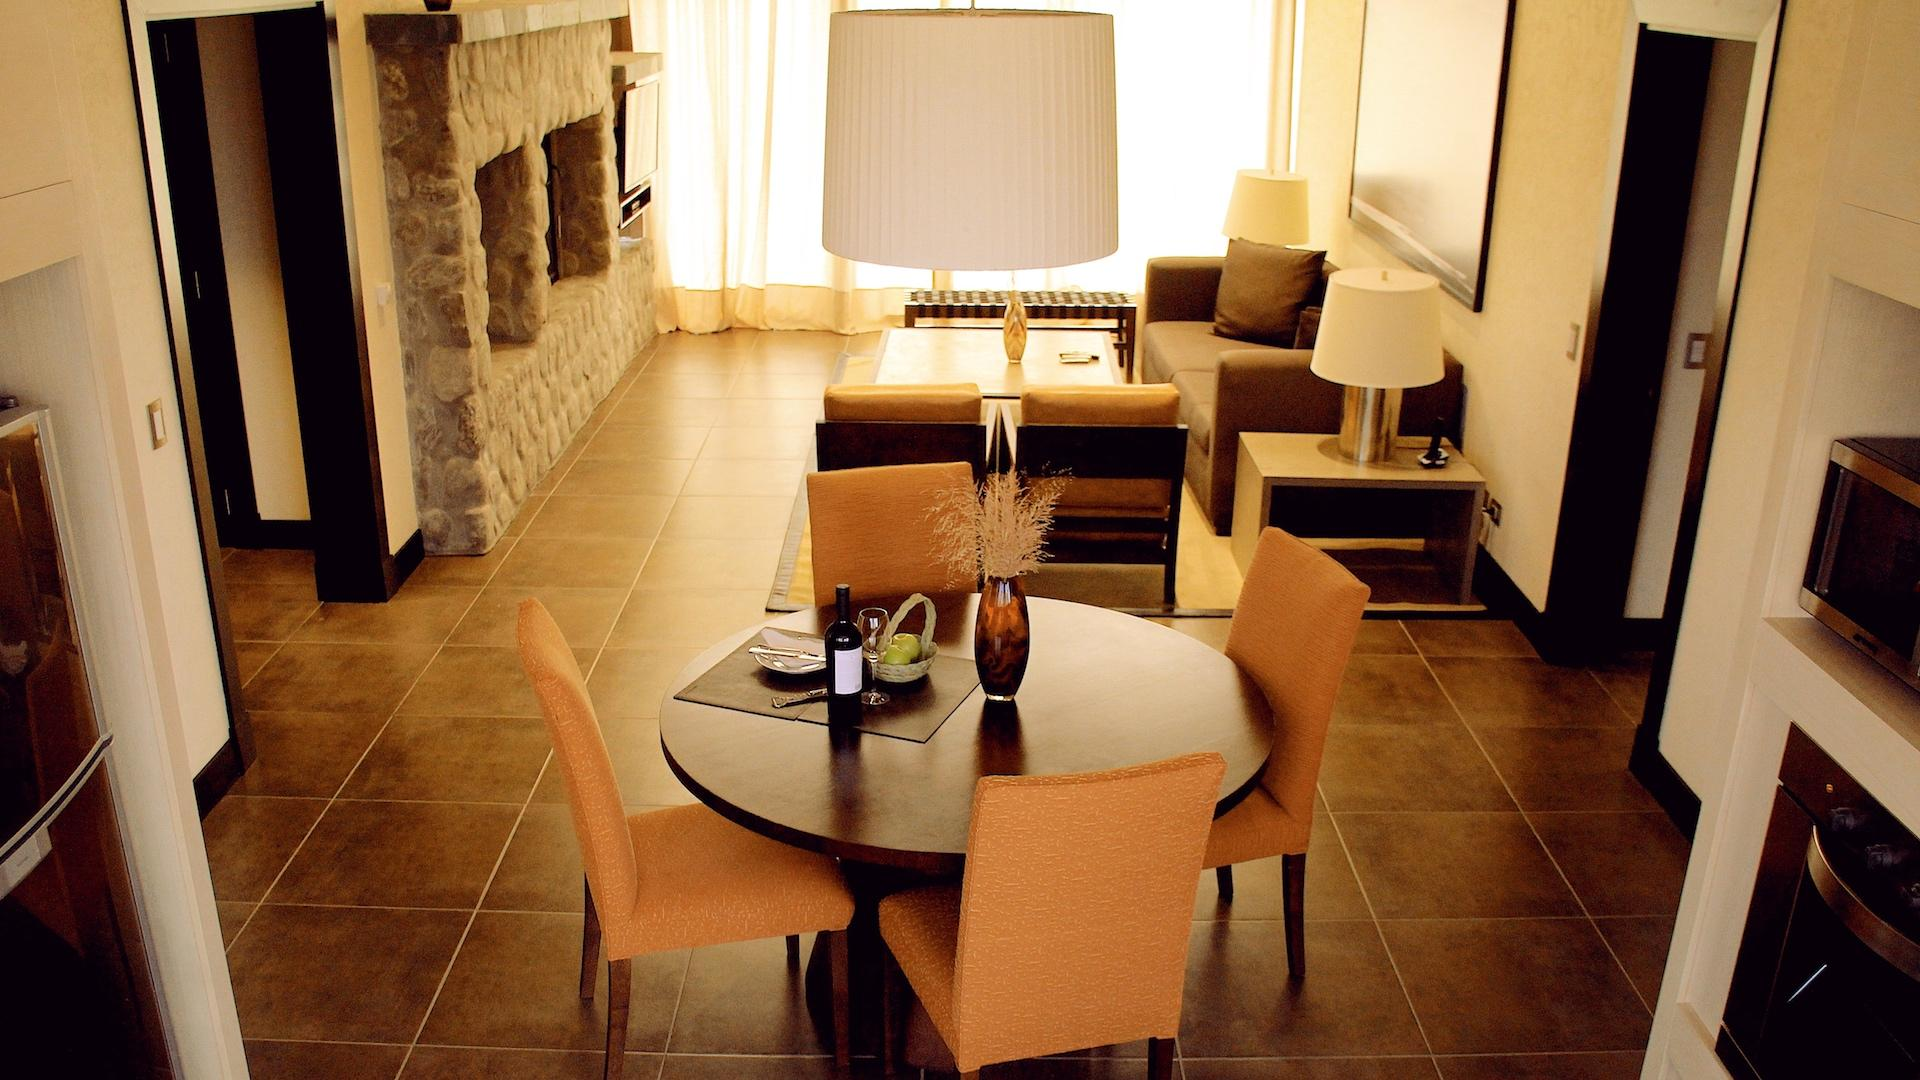 grace-hotel-cafayate-salta-resort-argentina-norbertosica-16102016-in3